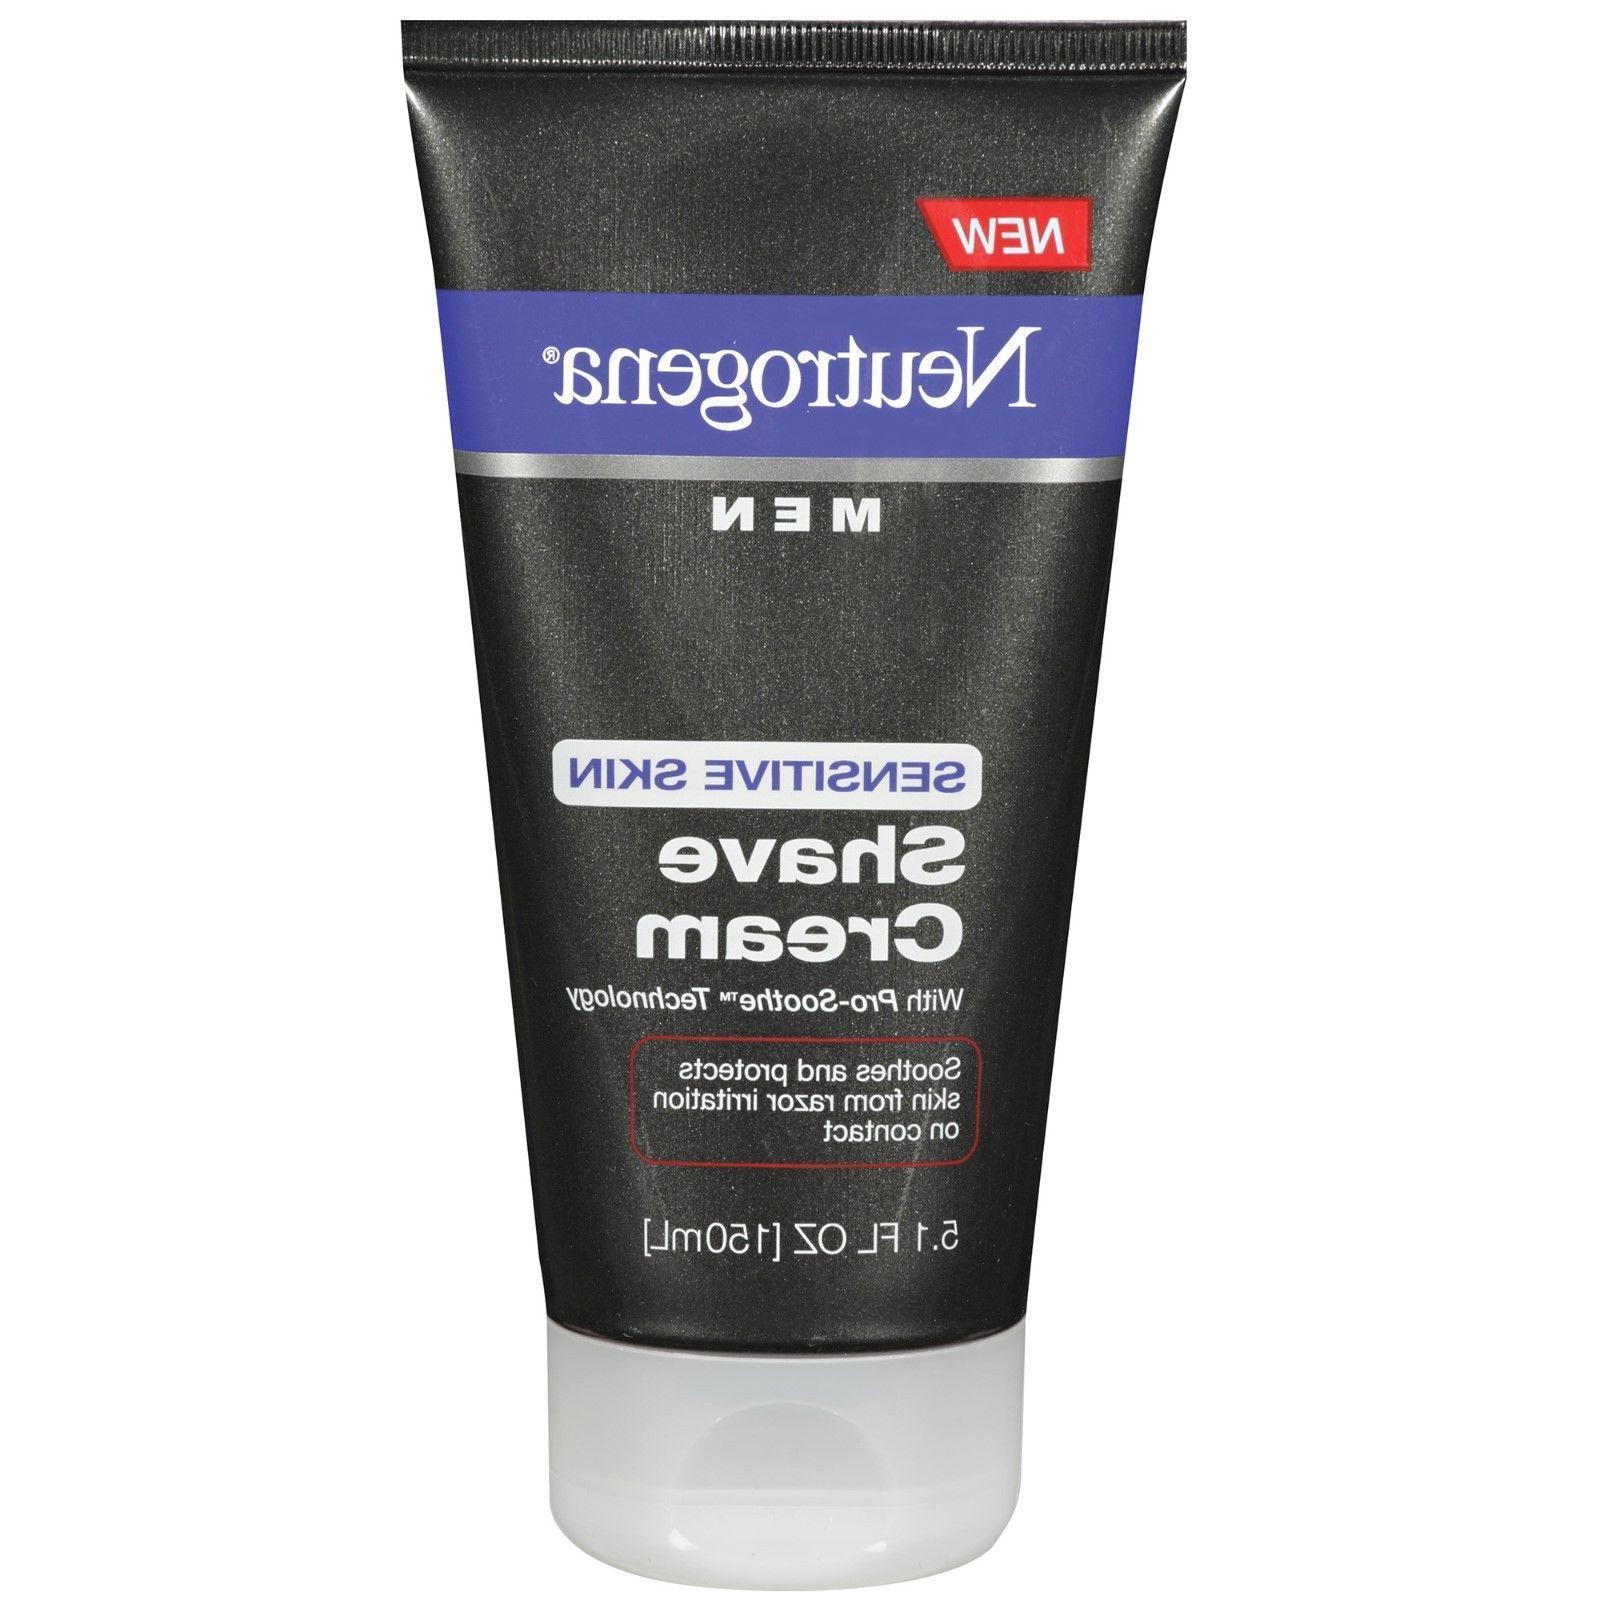 men shave cream for sensitive skin 5